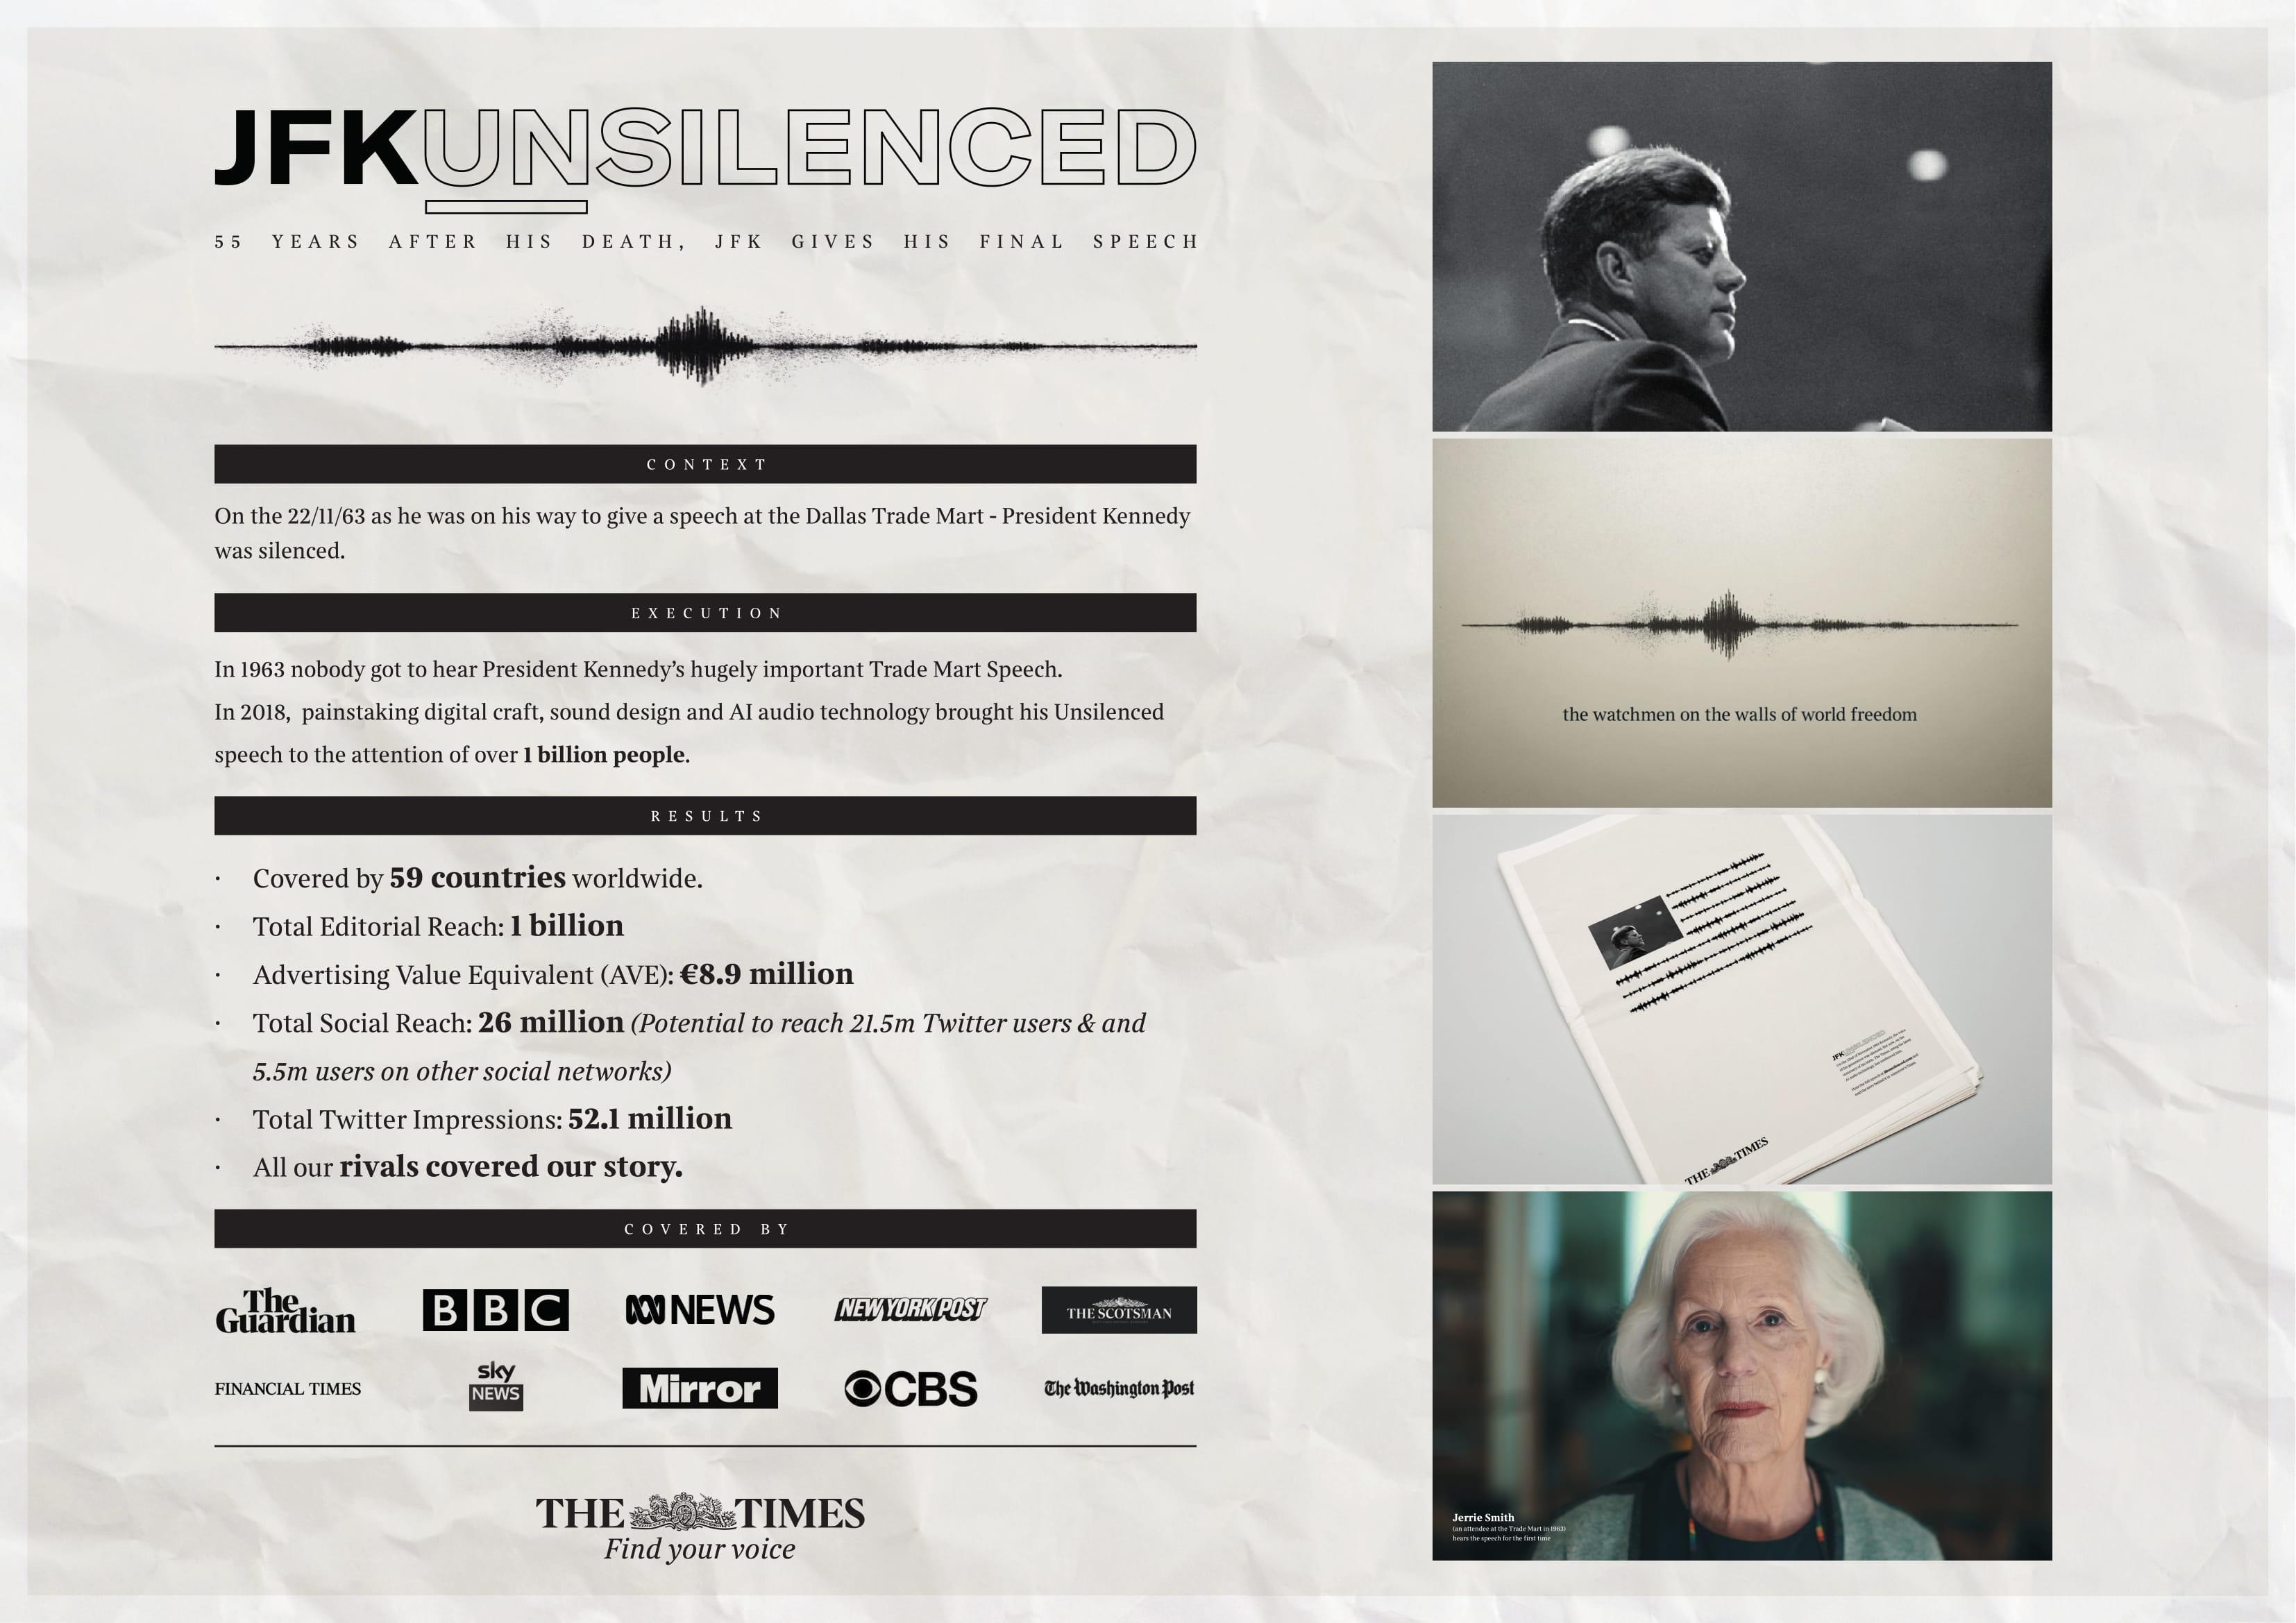 JFKunsilenced Thumbnail